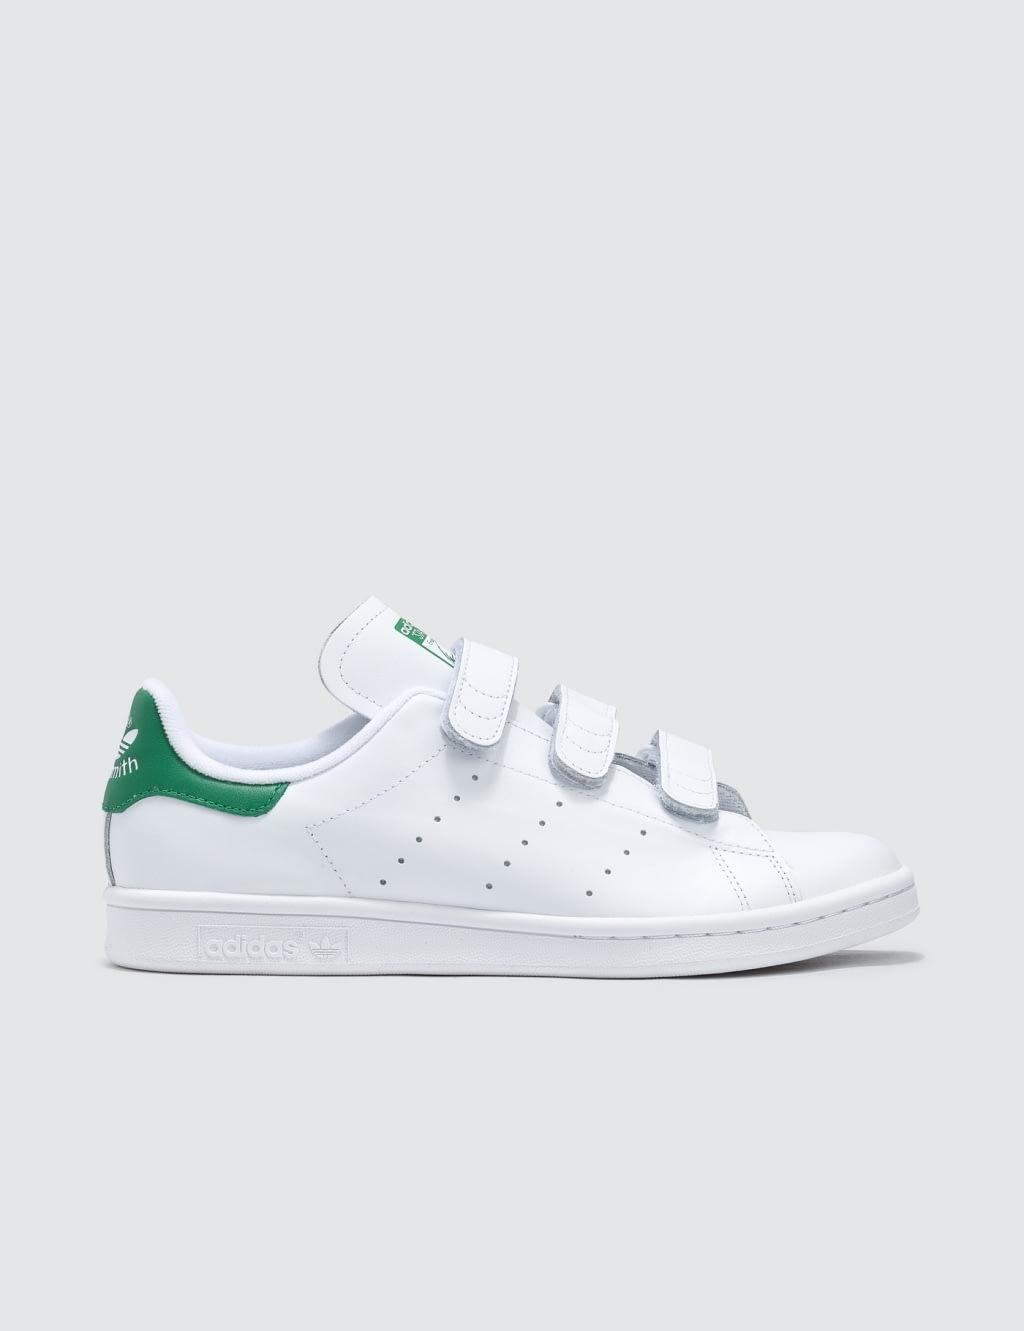 Smith Cf Originals Adidas 118b8 Greece Stan 4c75c tqg6WwP